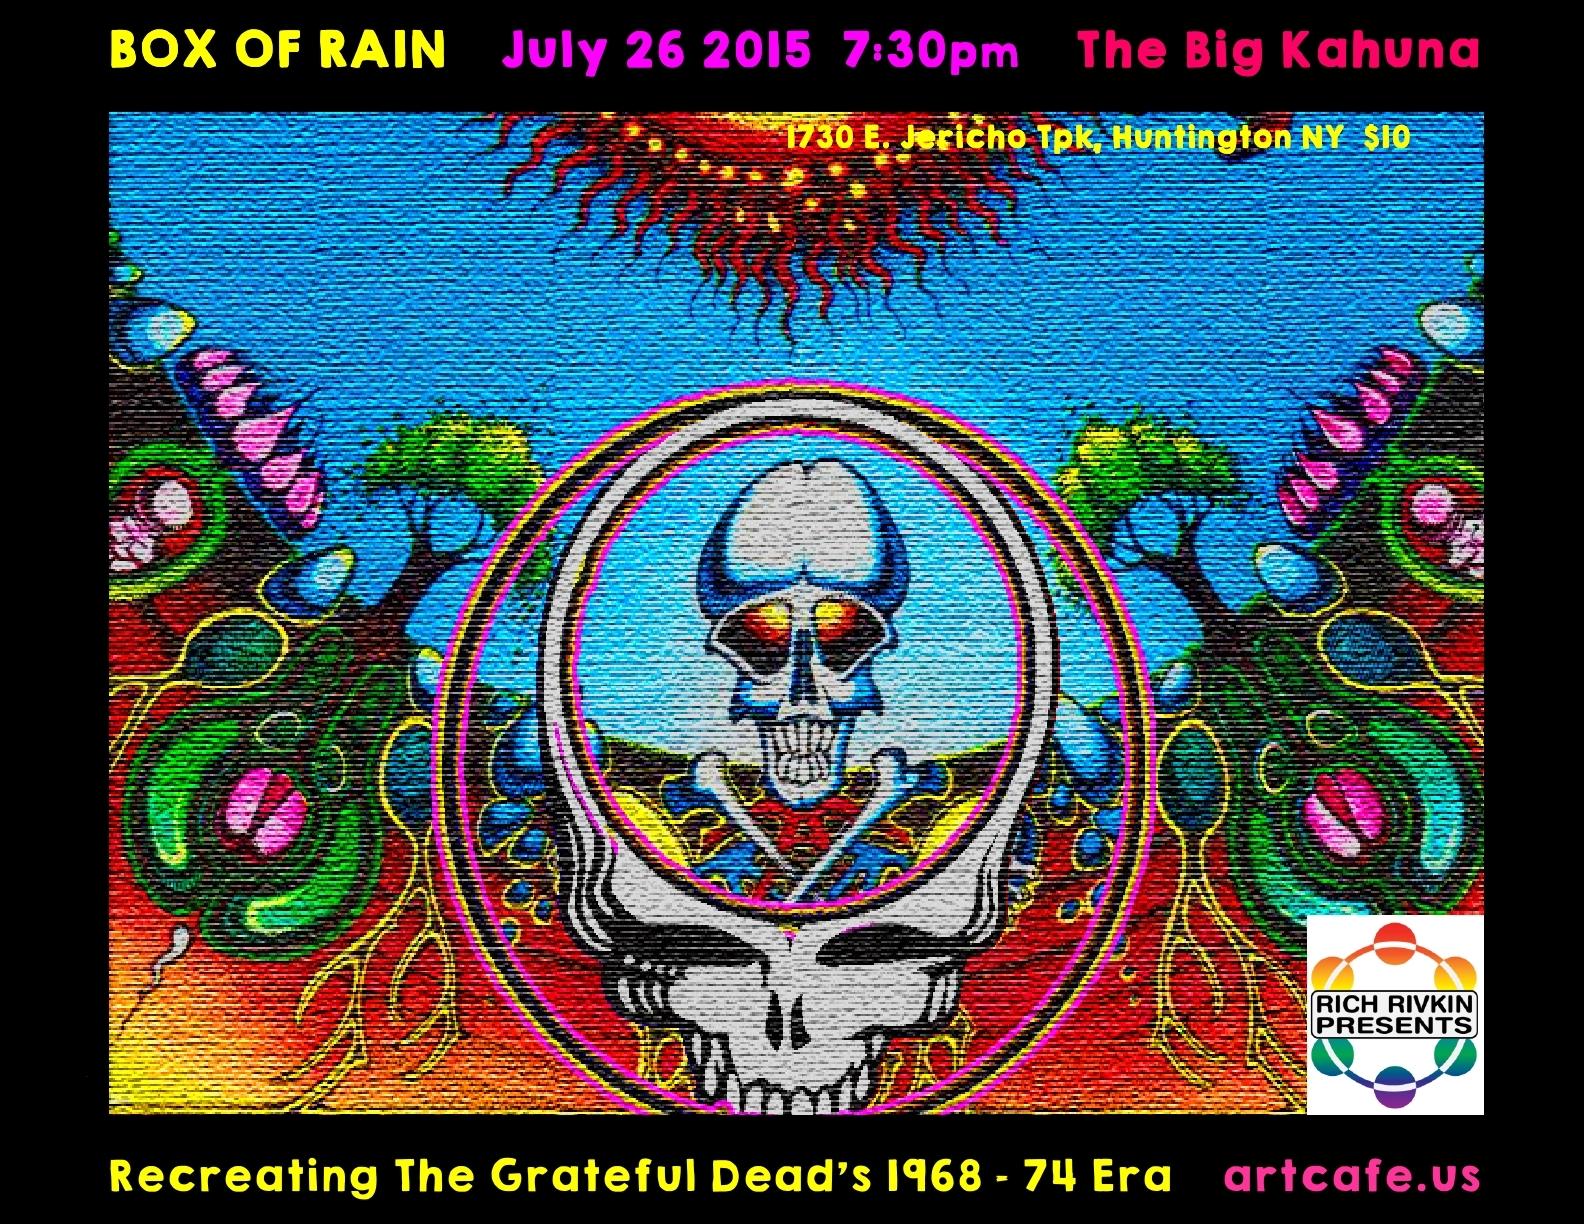 BOX OF RAIN poster 12